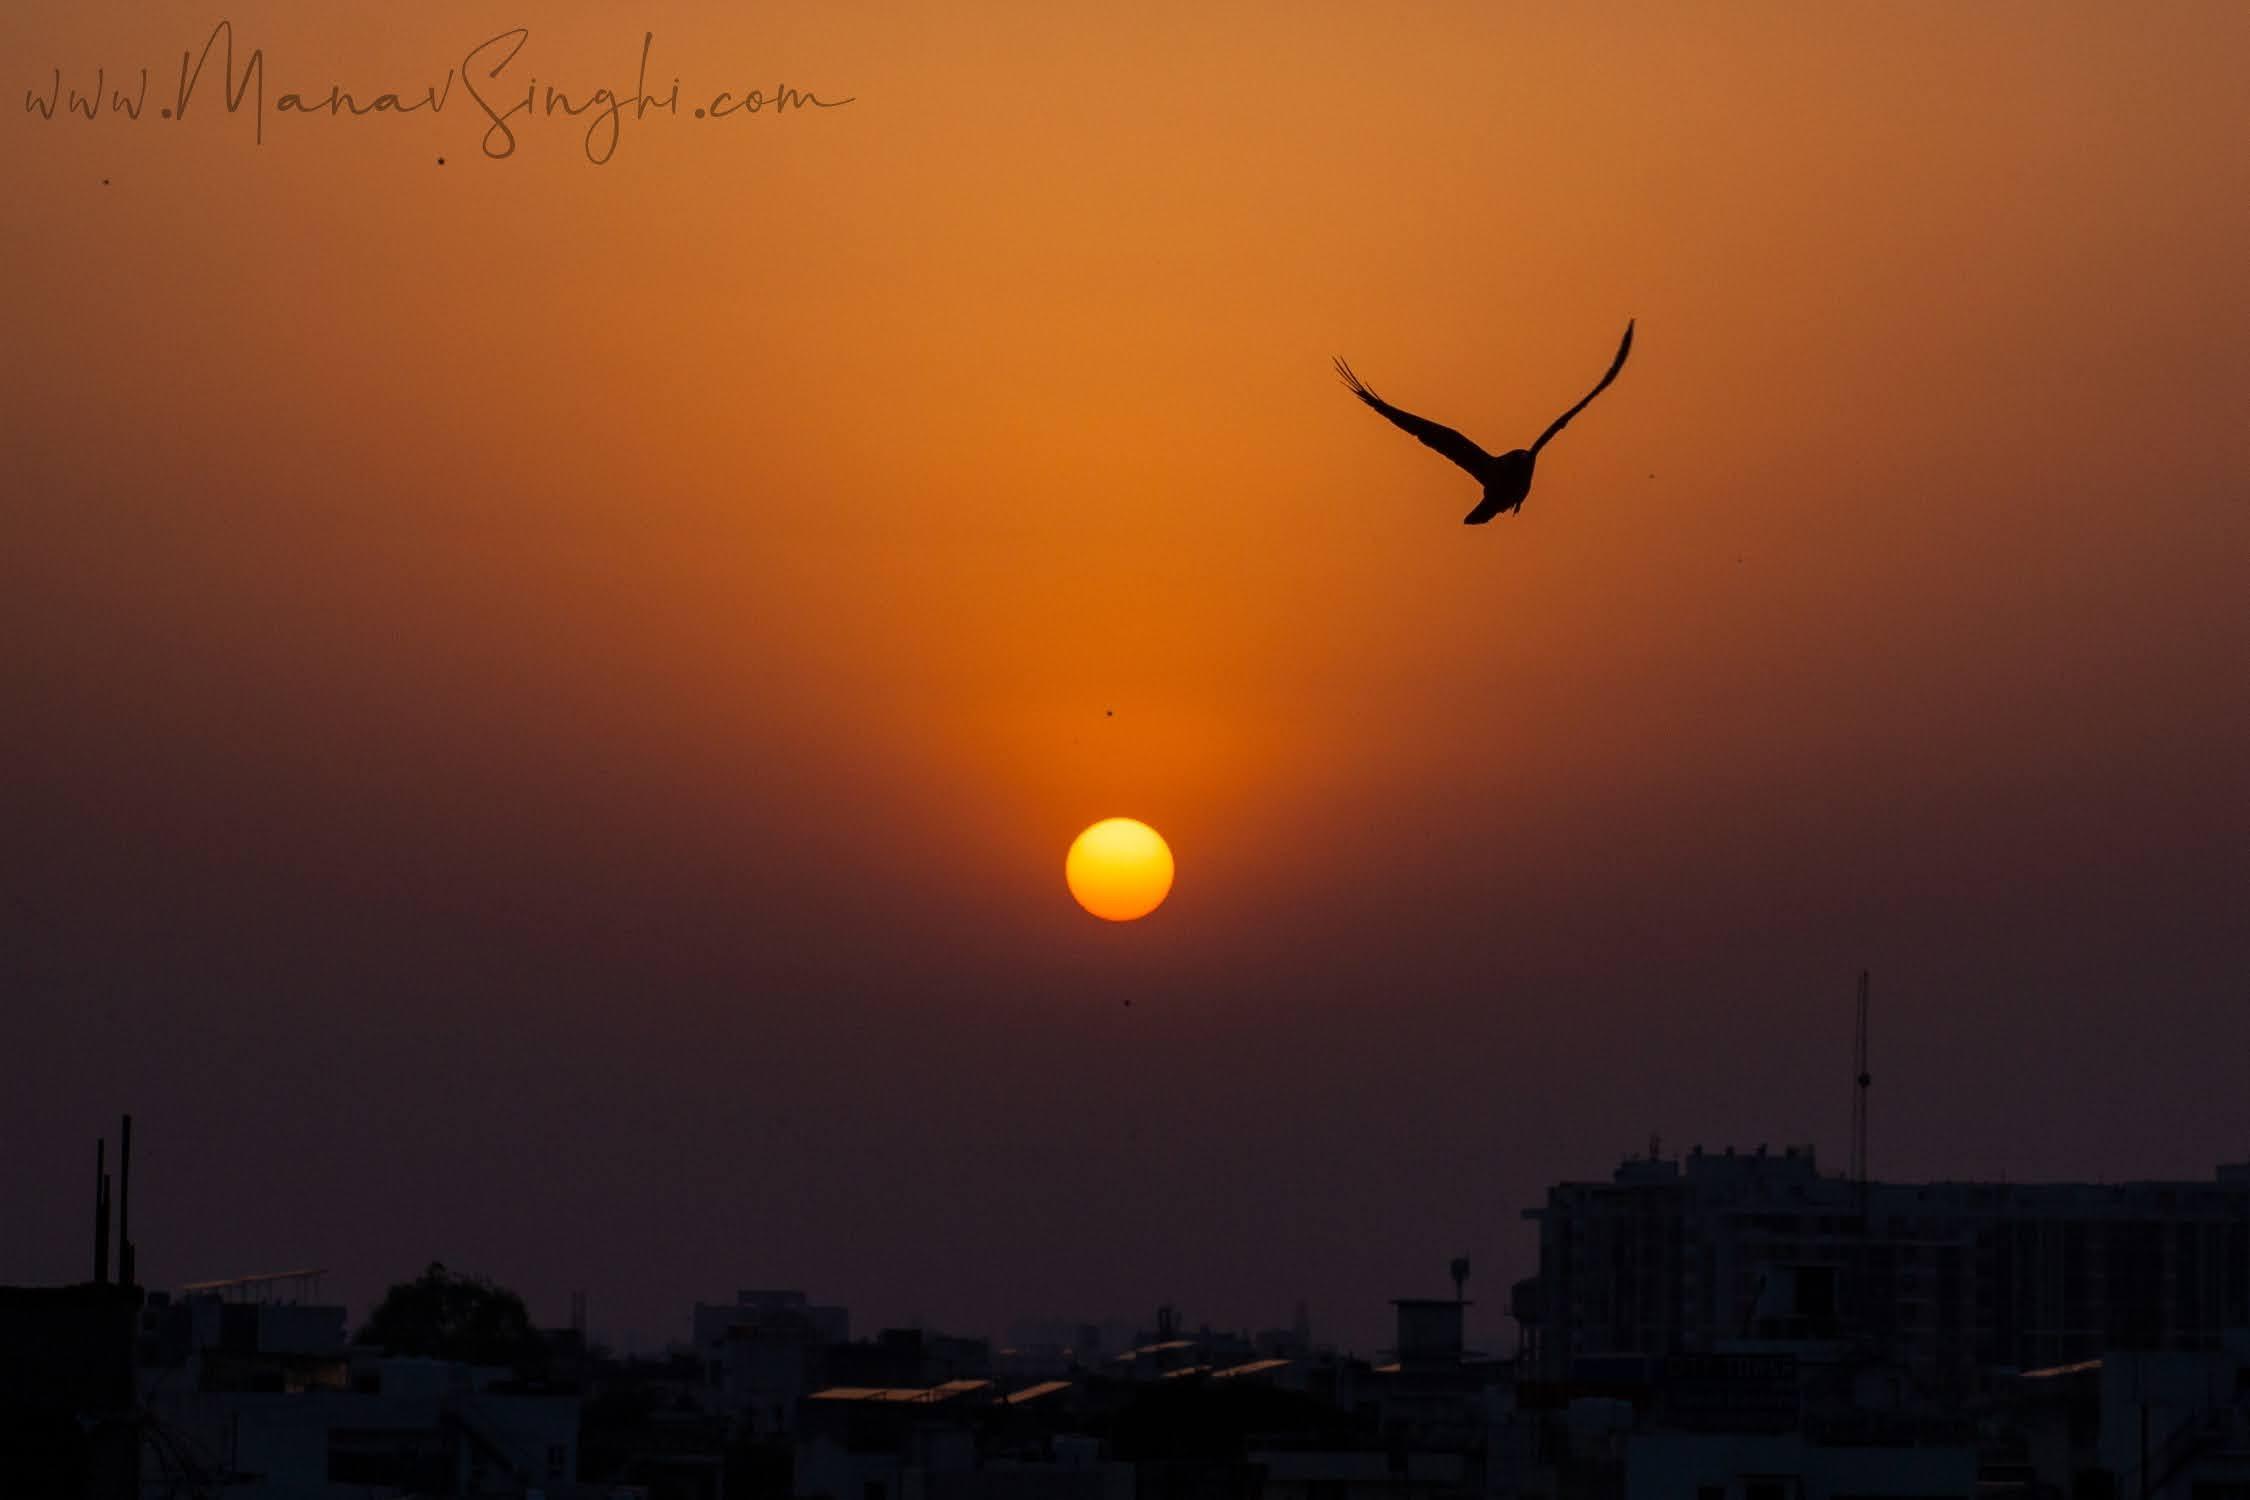 Shots around Sunset taken from my terrace, Jaipur.